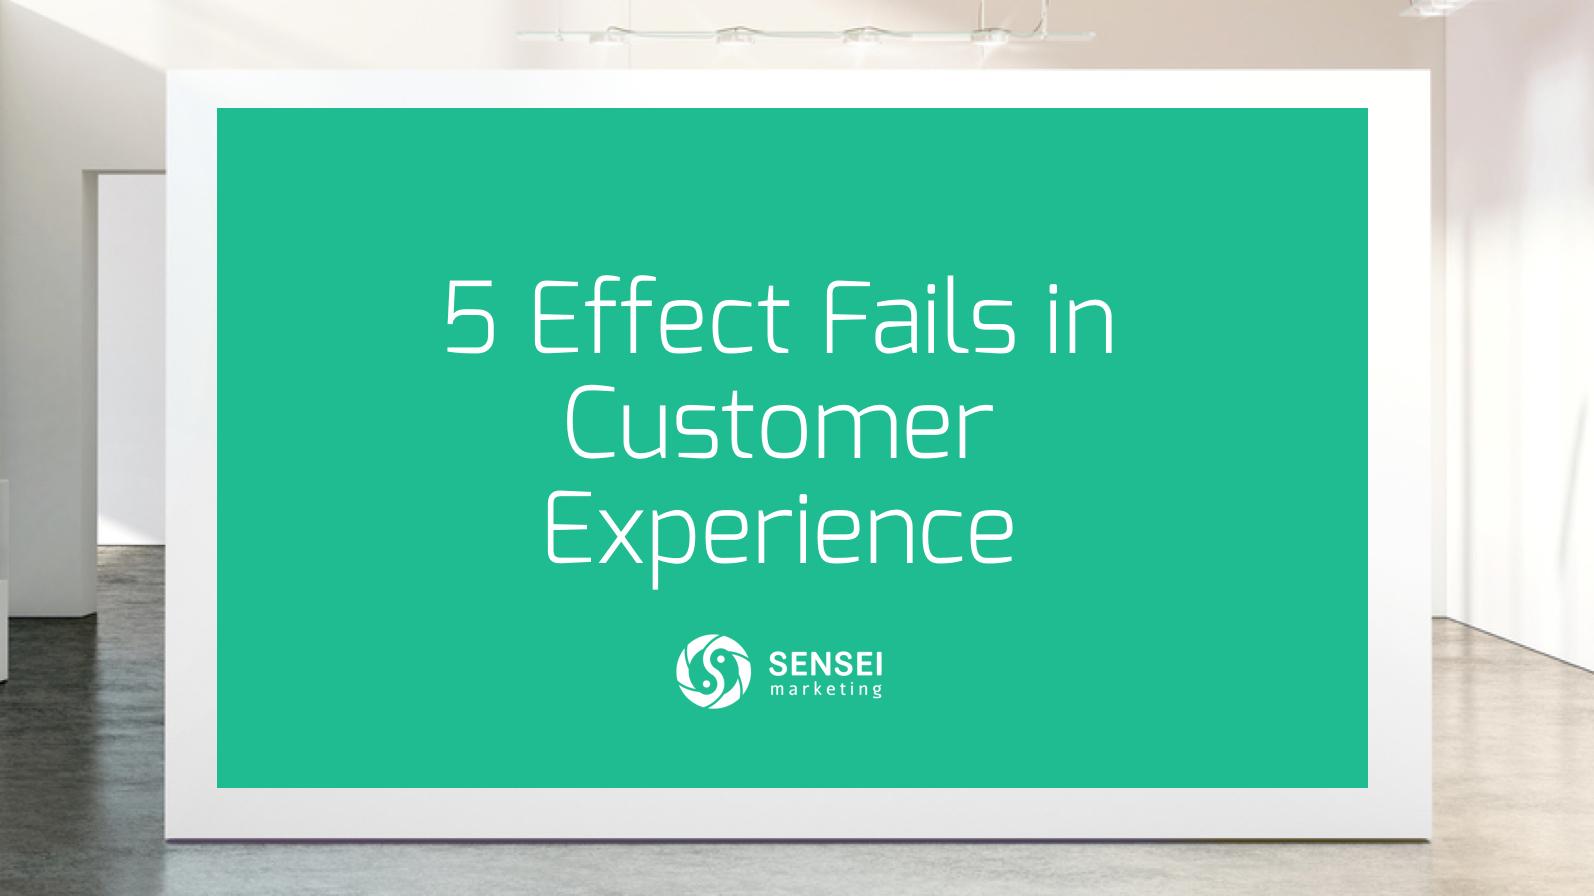 5 Effect Fails in Customer Experience   Sensei Marketing